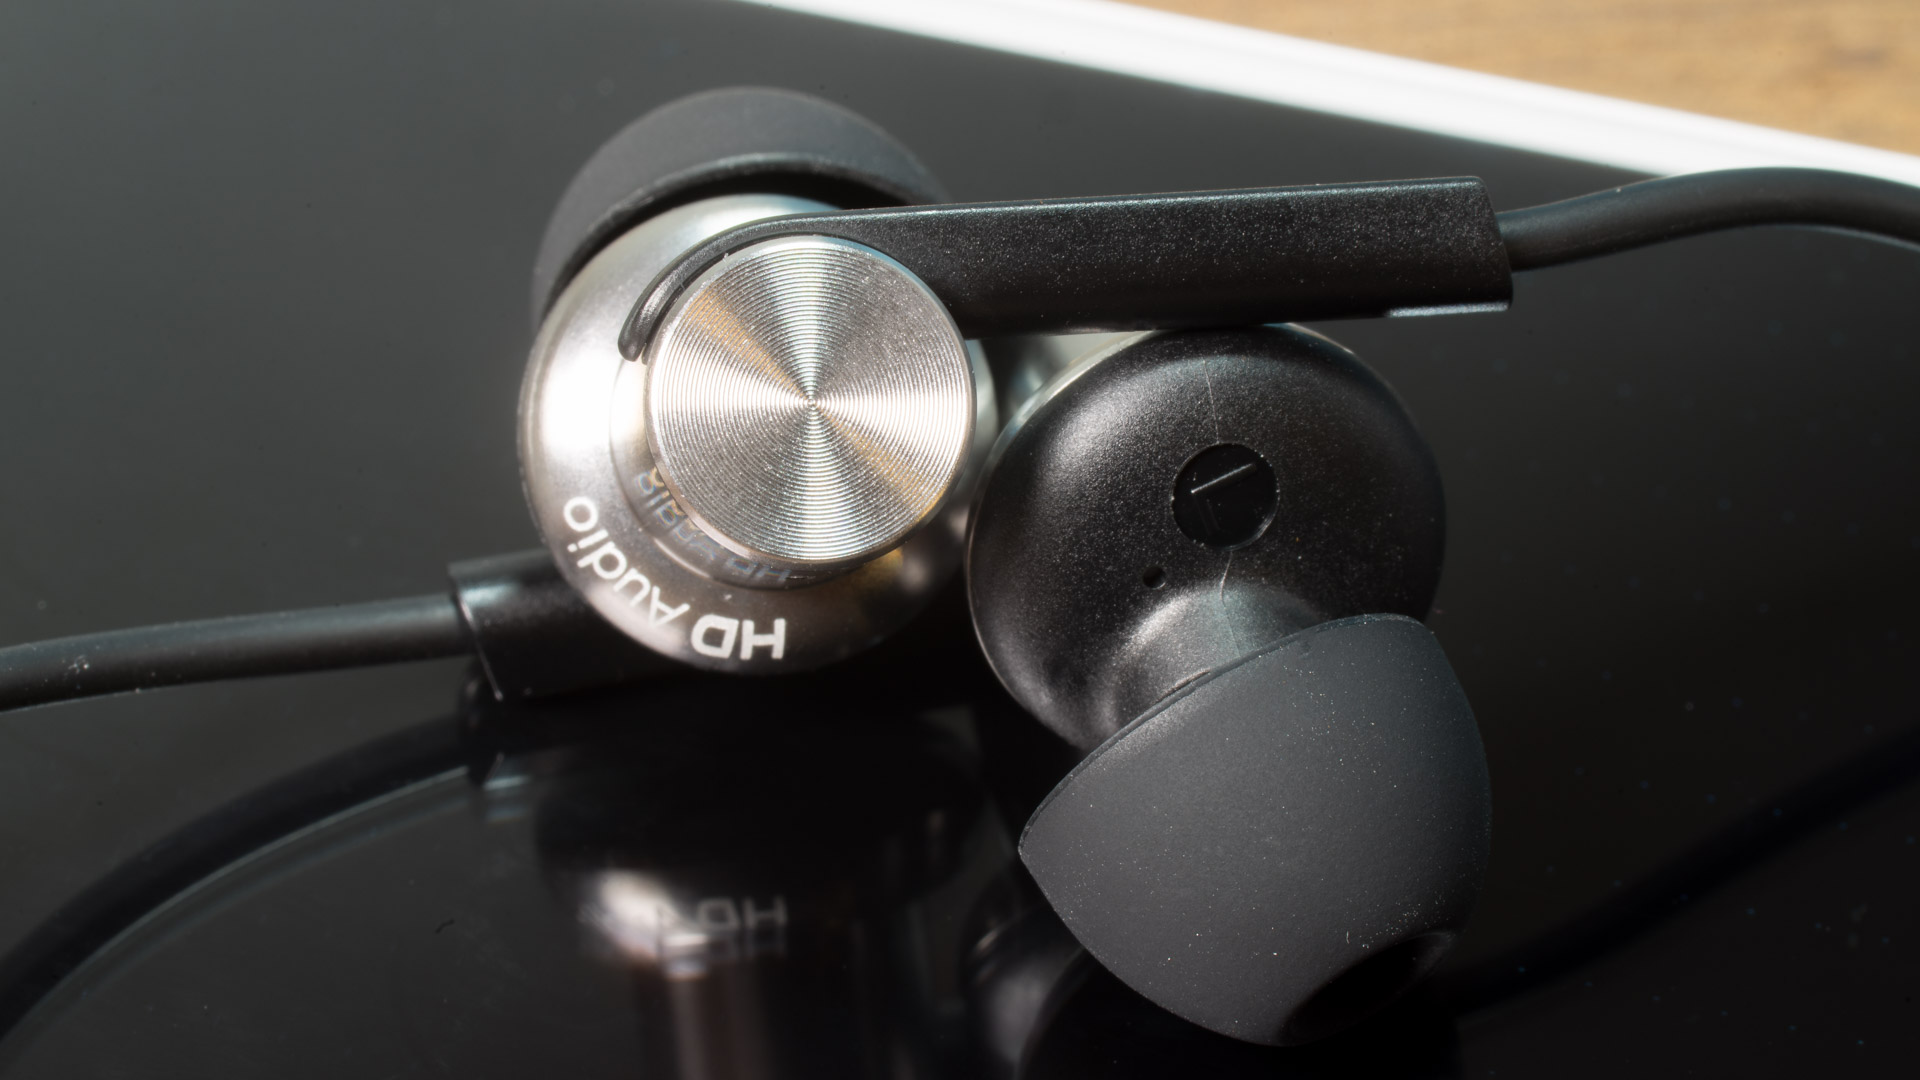 Xiaomi Hybrid Dual Driver In Ears Im Test Piston 4 Techtest Mi Drivers Earphones Review 100